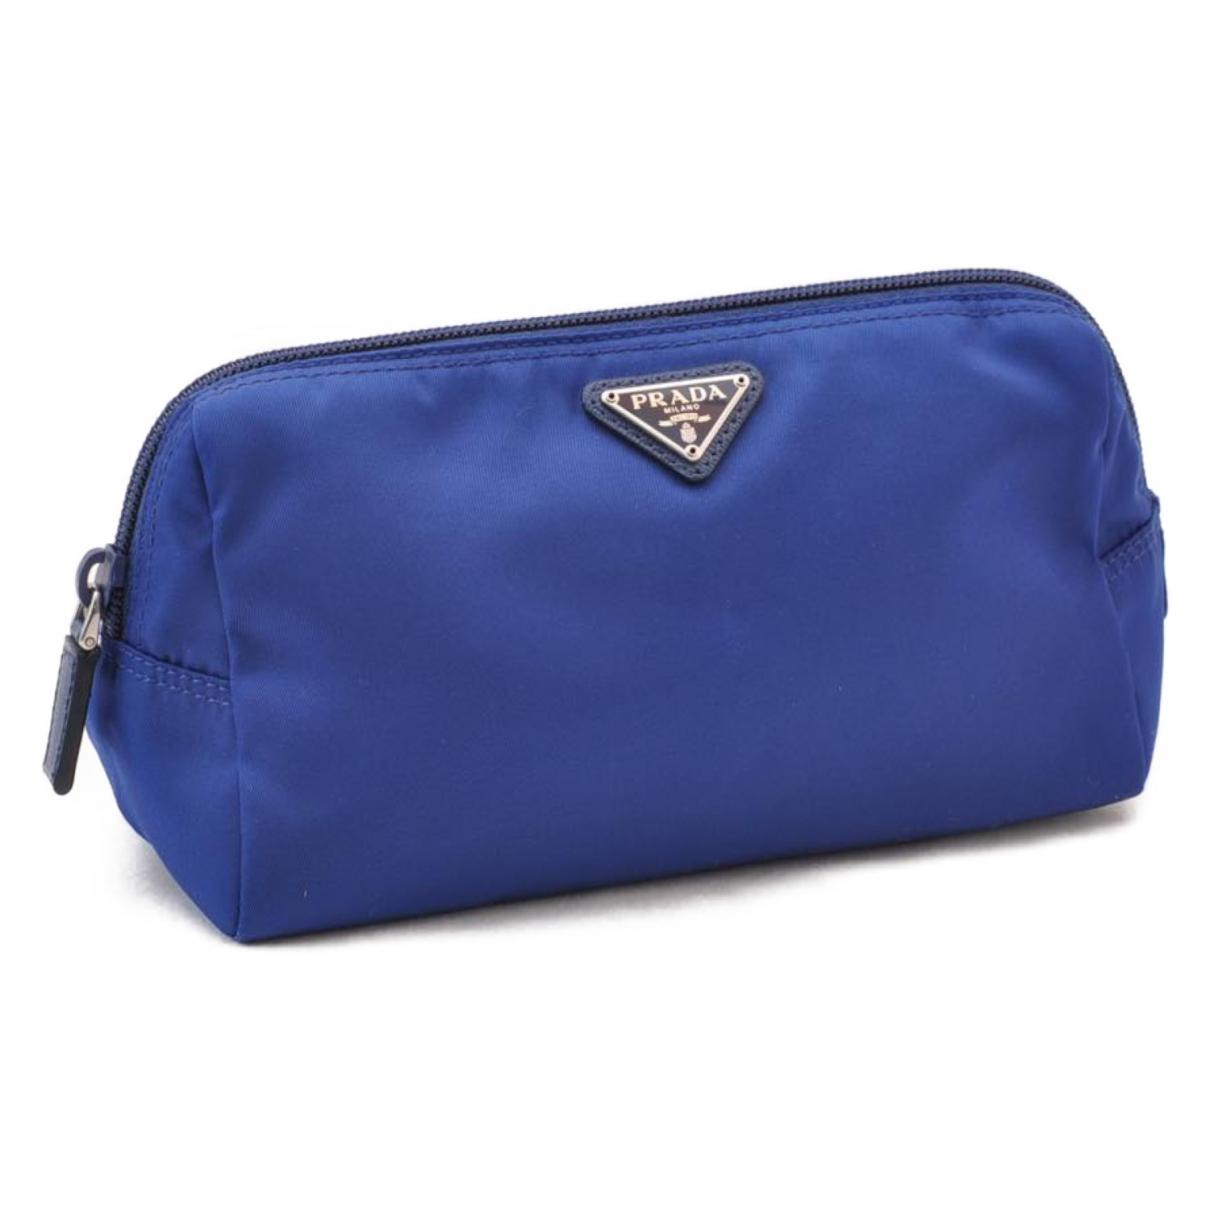 Prada - Pochette   pour femme en toile - bleu